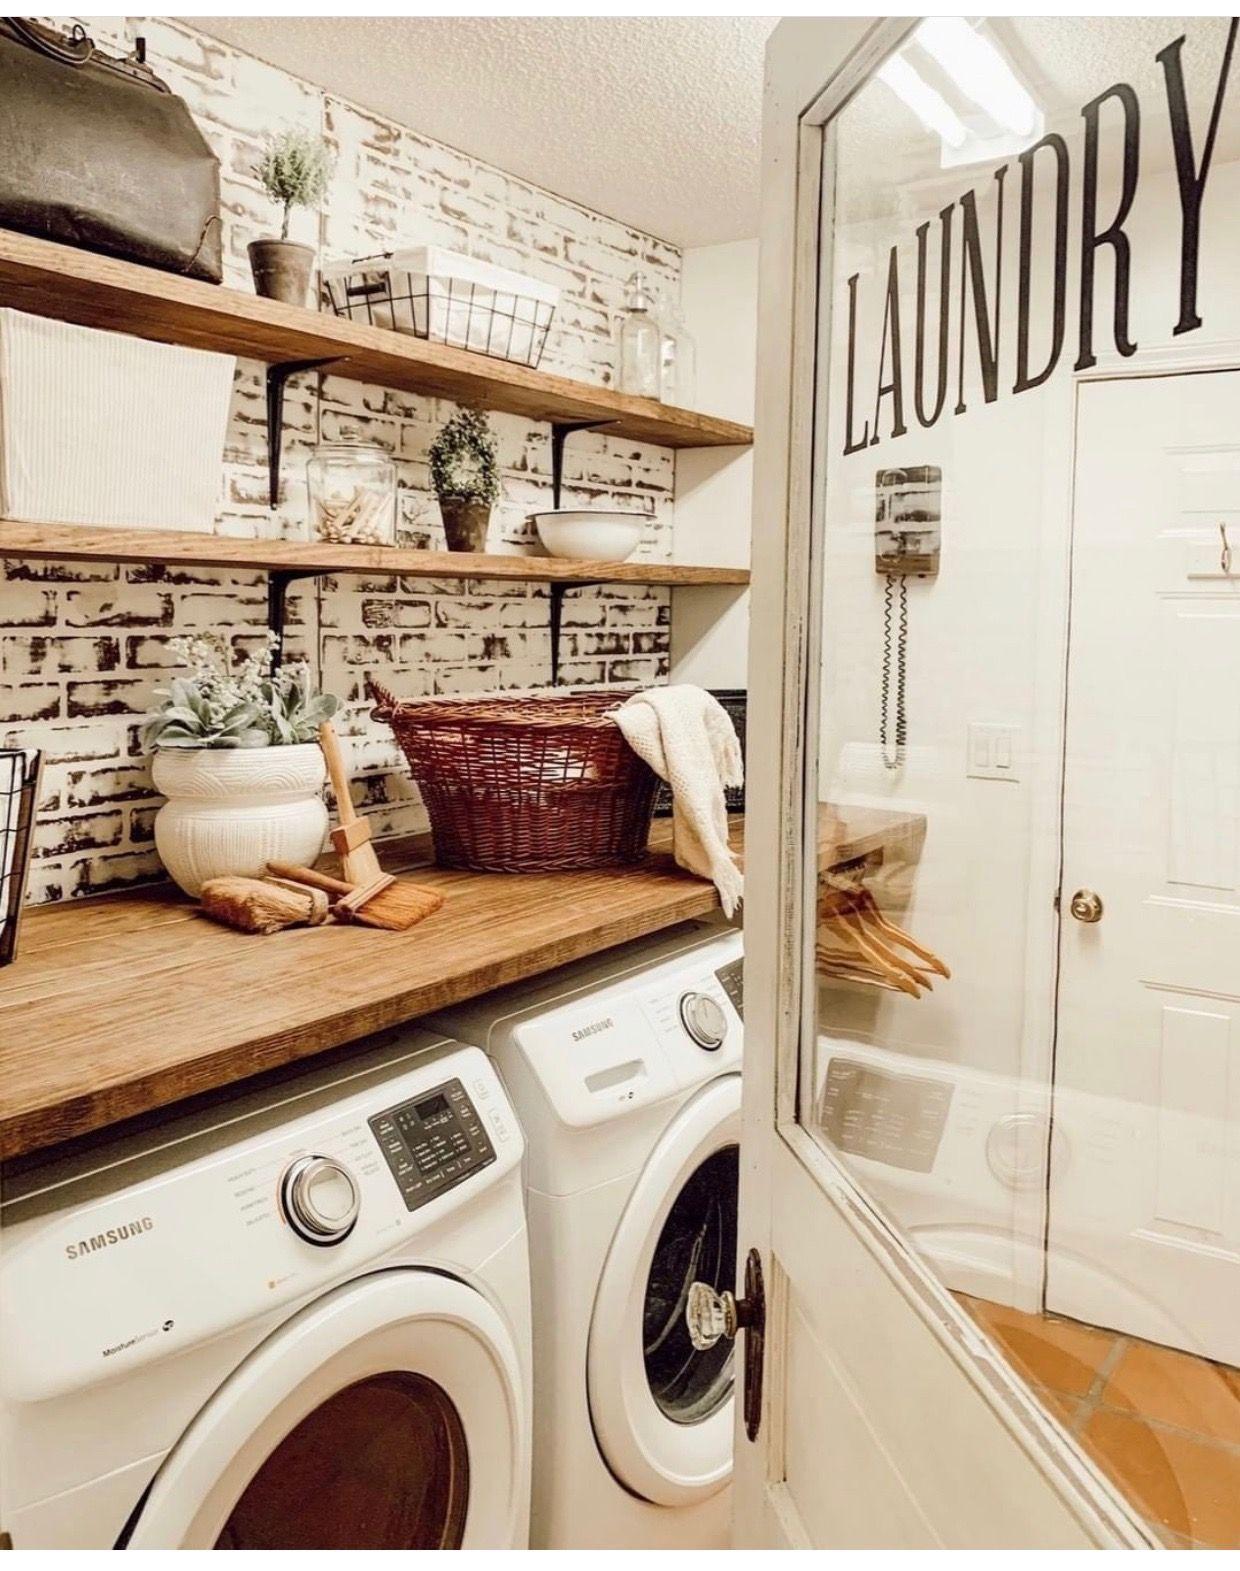 10x10 Laundry Room Layout: Idea By Rory Evert On Laundry Room